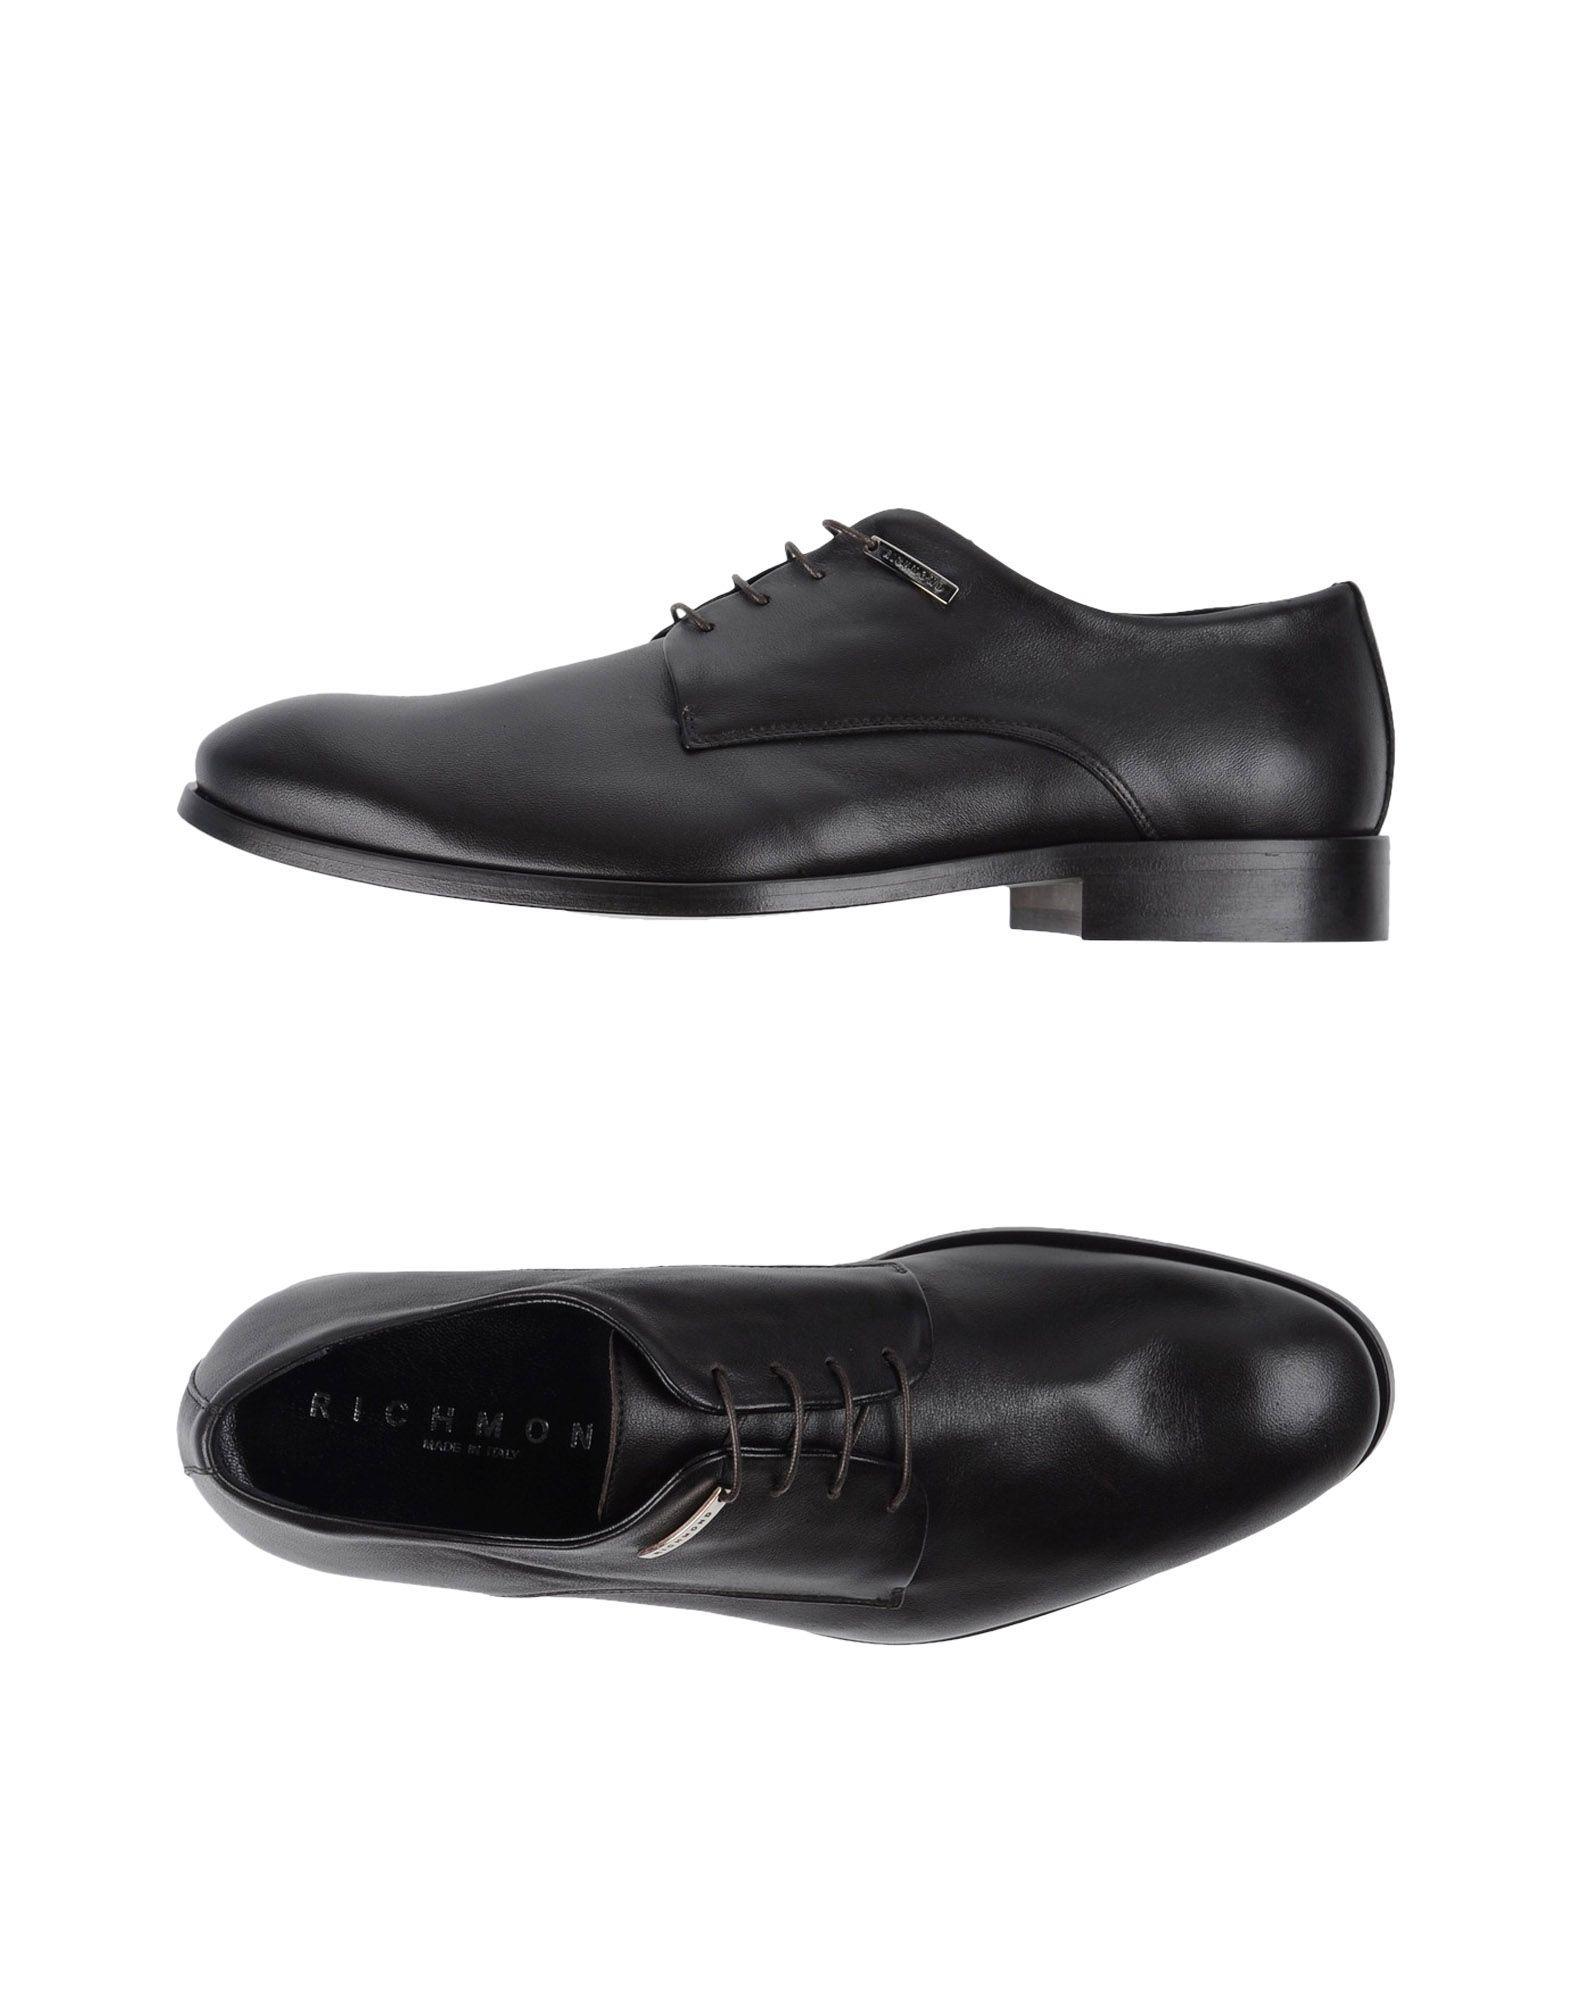 Rabatt echte  Schuhe Richmond Schnürschuhe Herren  echte 11345330WM 135999